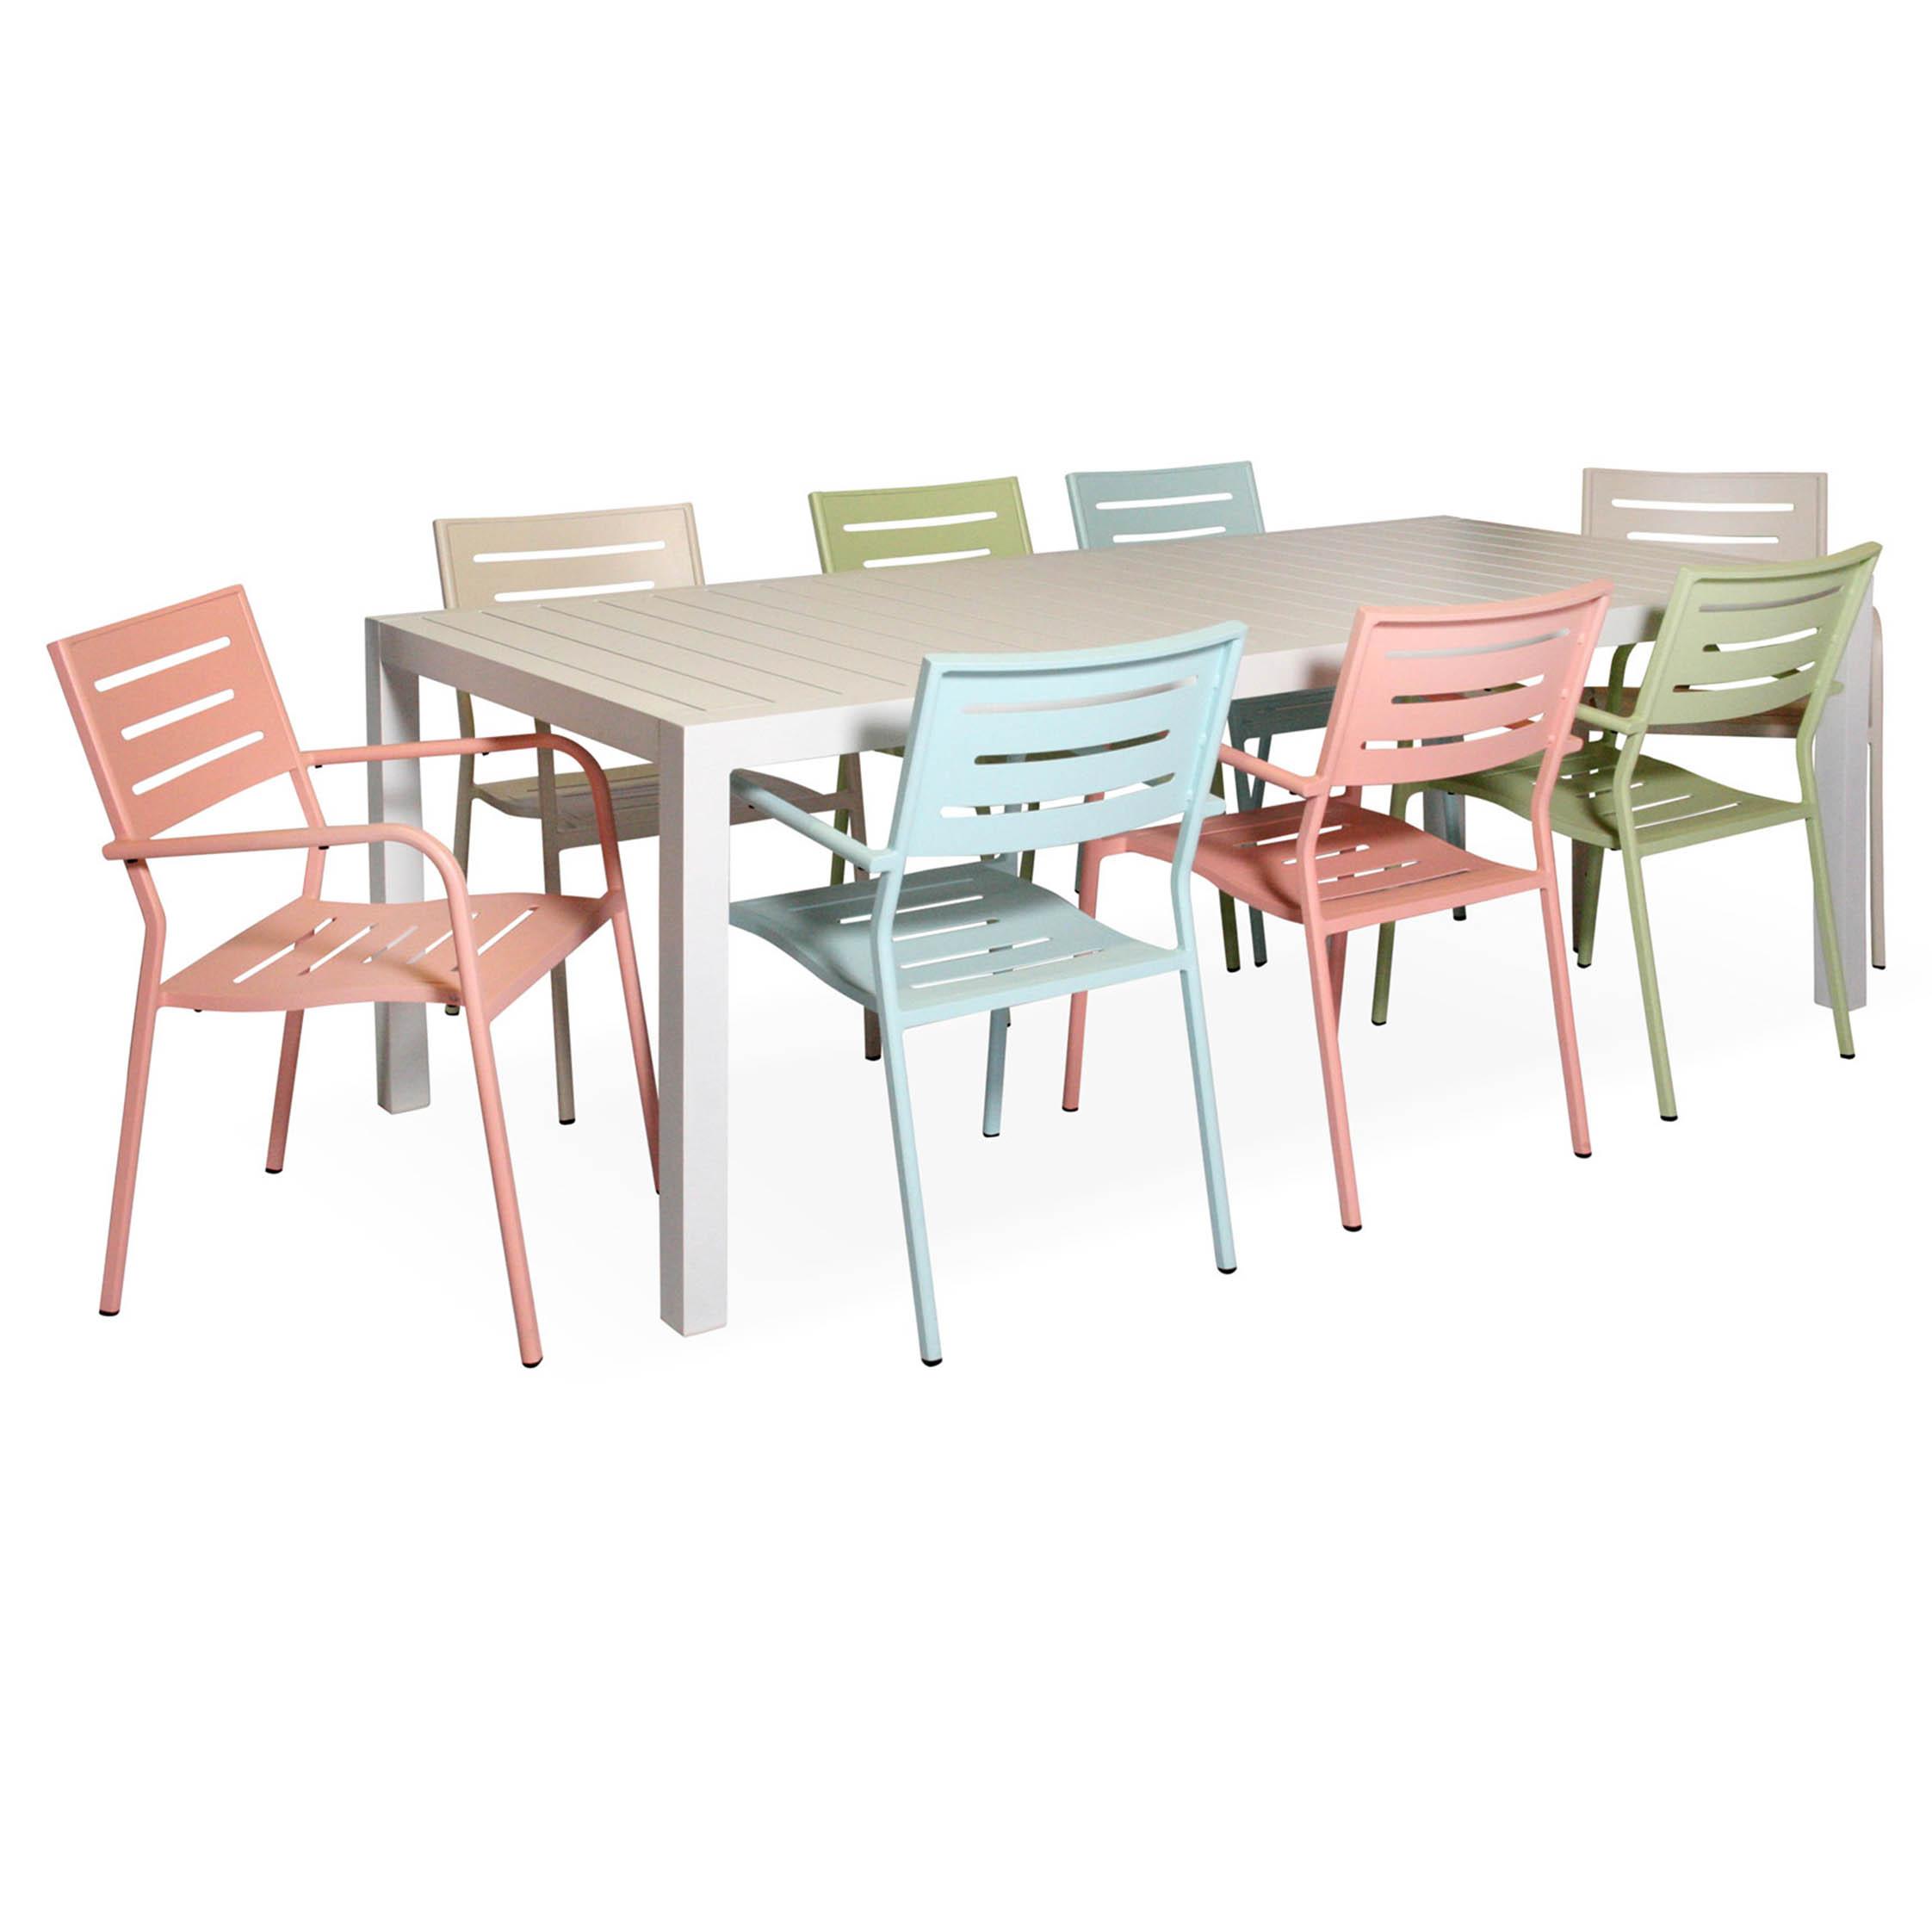 Reado 8 seater Dining set